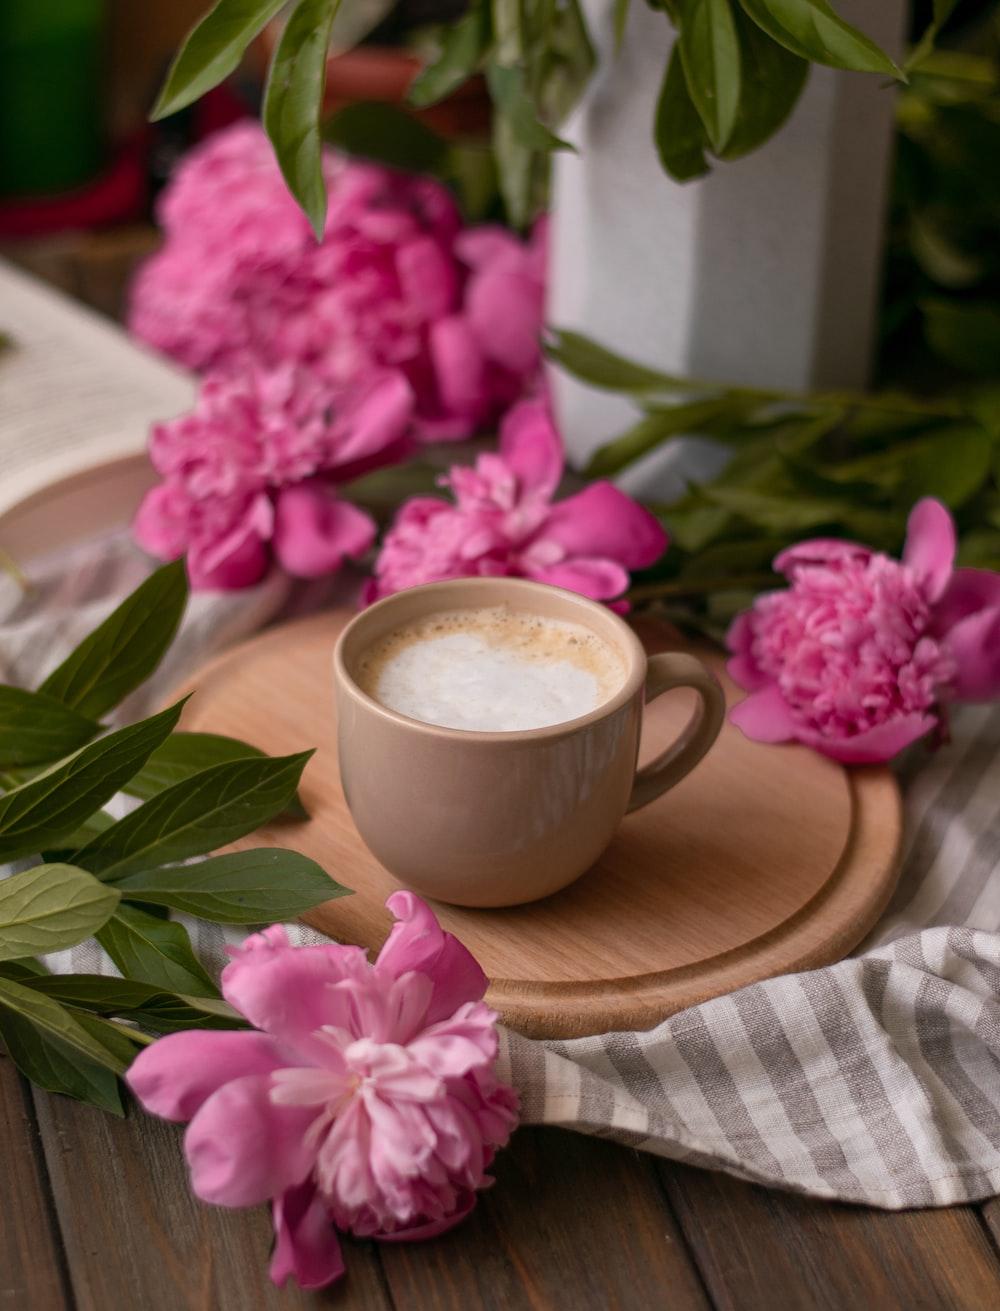 brown ceramic teacup with latte